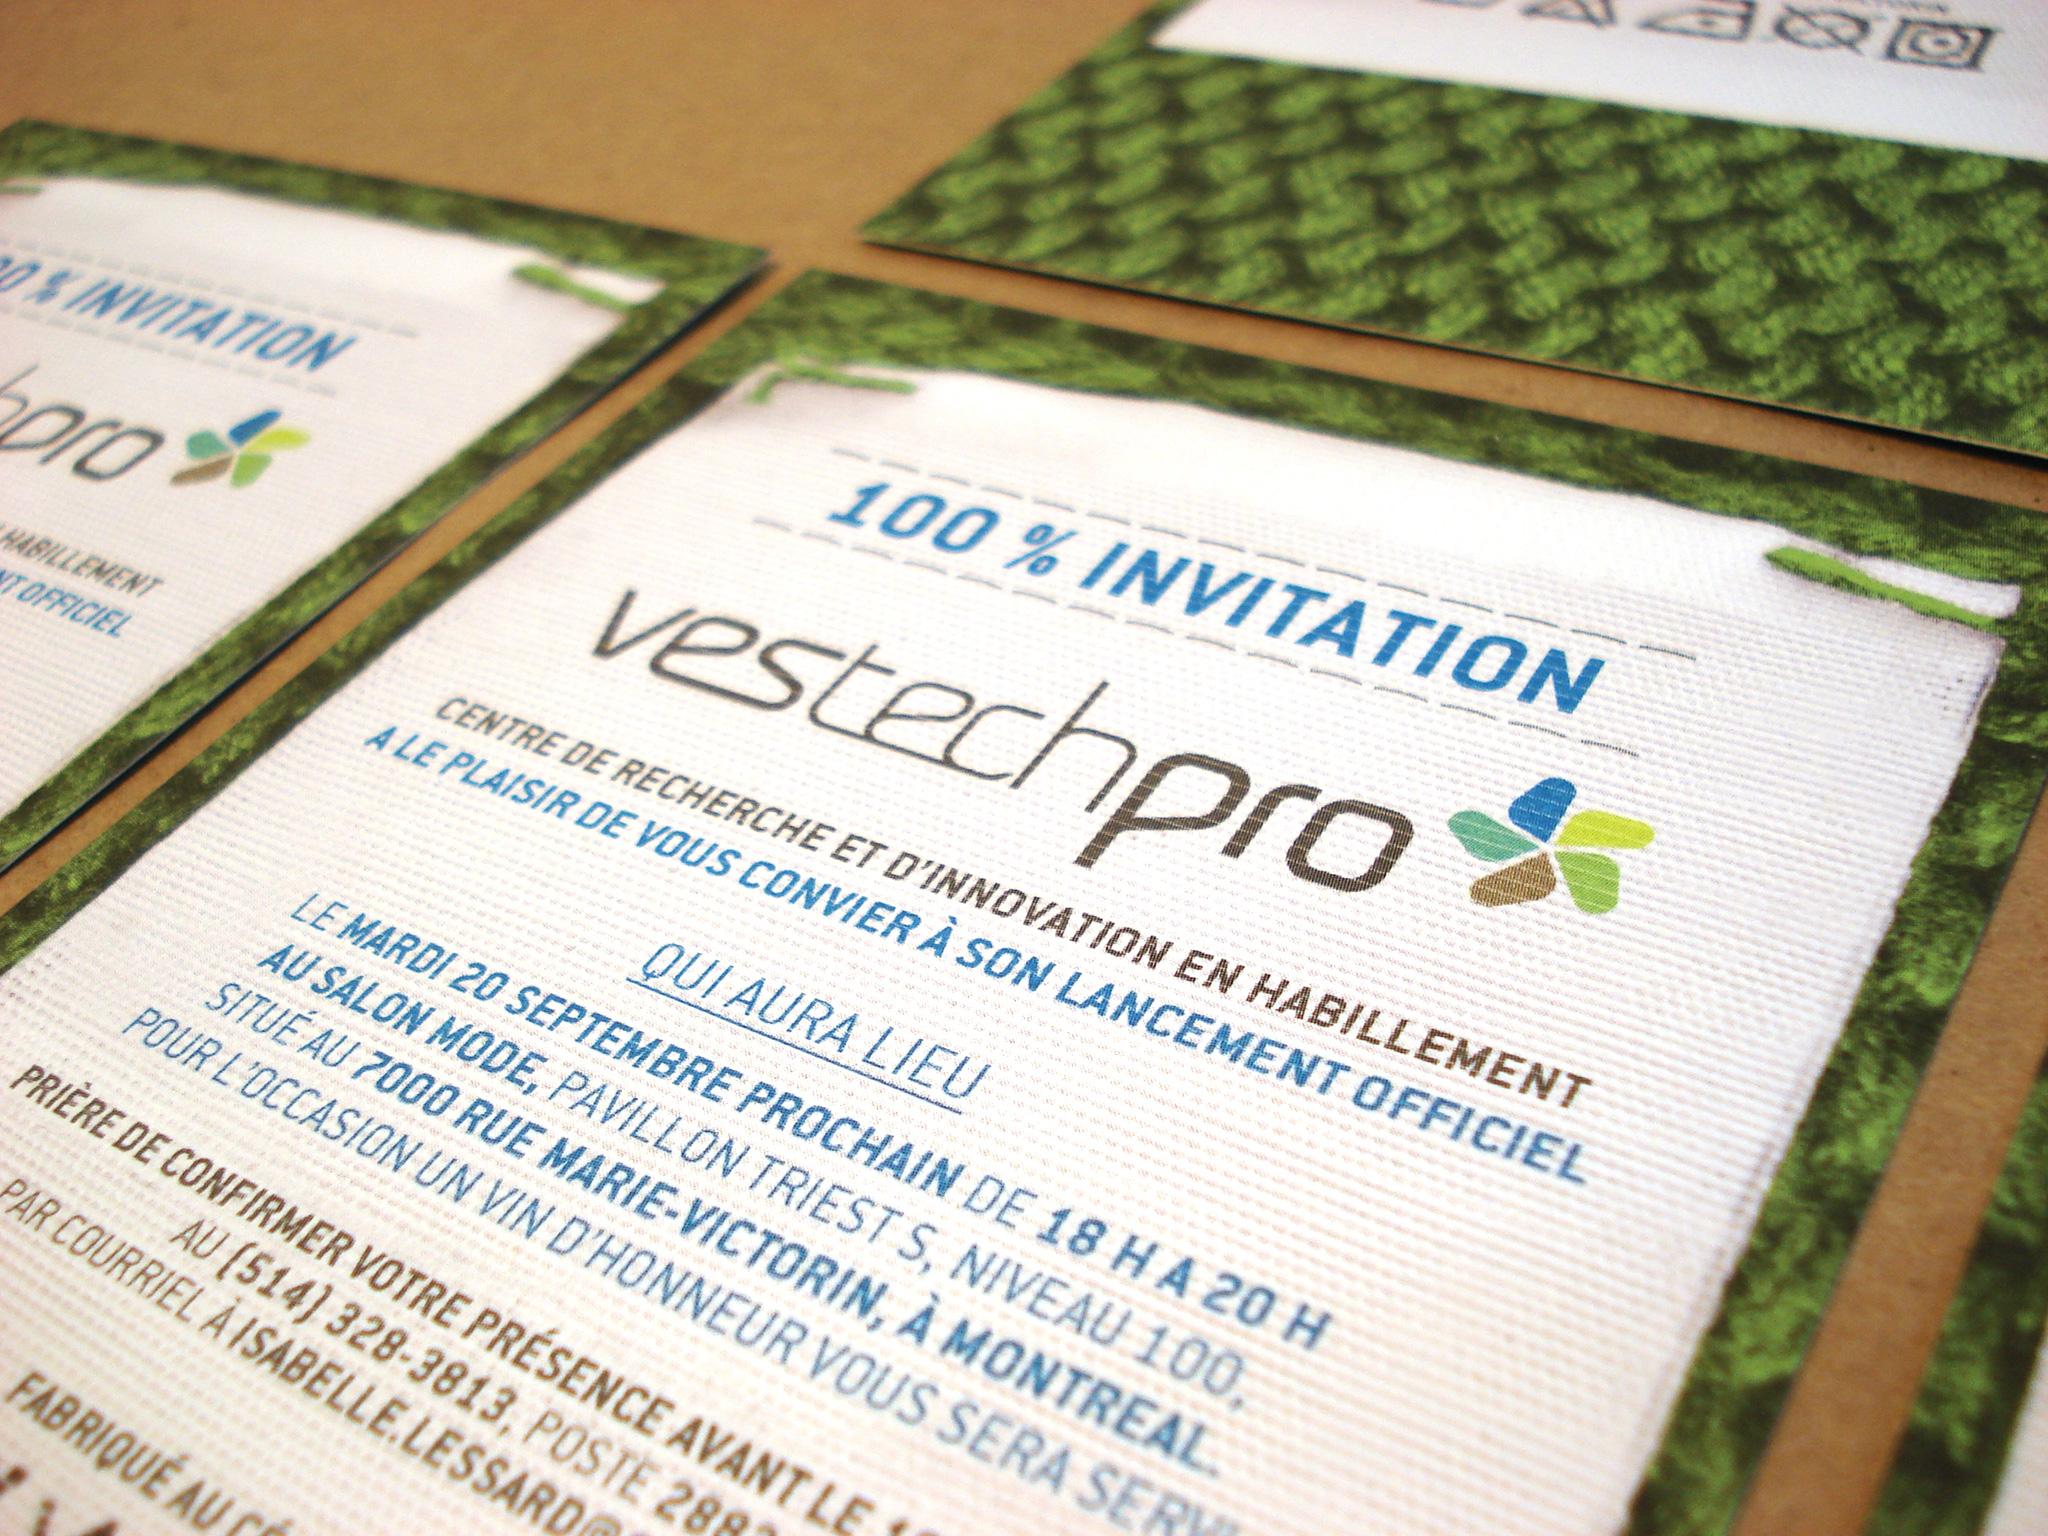 Carton d'invitation de Vestechpro.